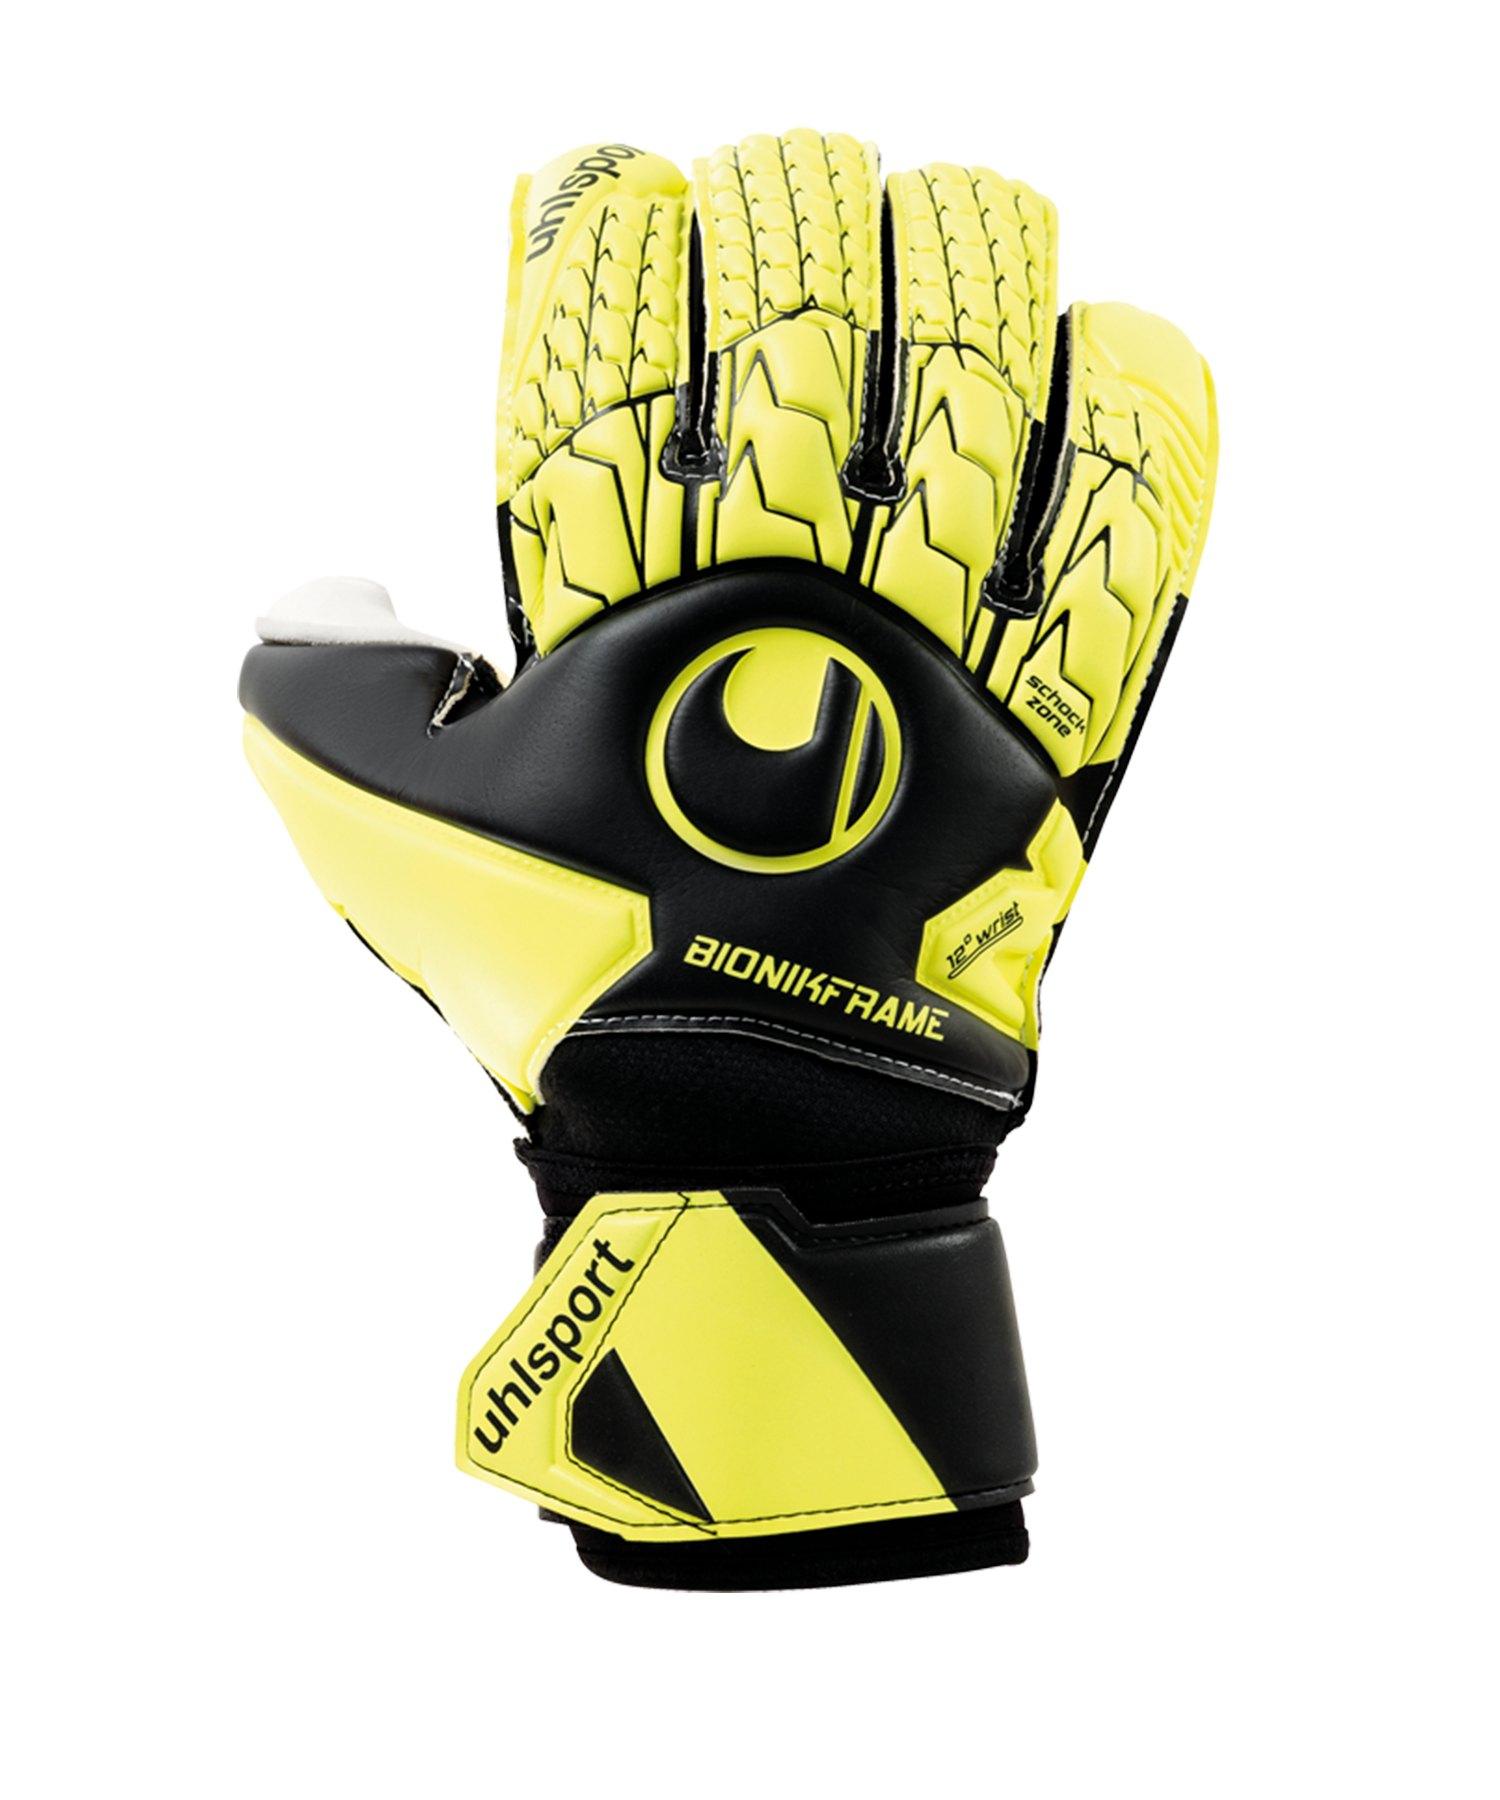 Uhlsport AG Bionik TW-Handschuhe Schwarz F01 - schwarz